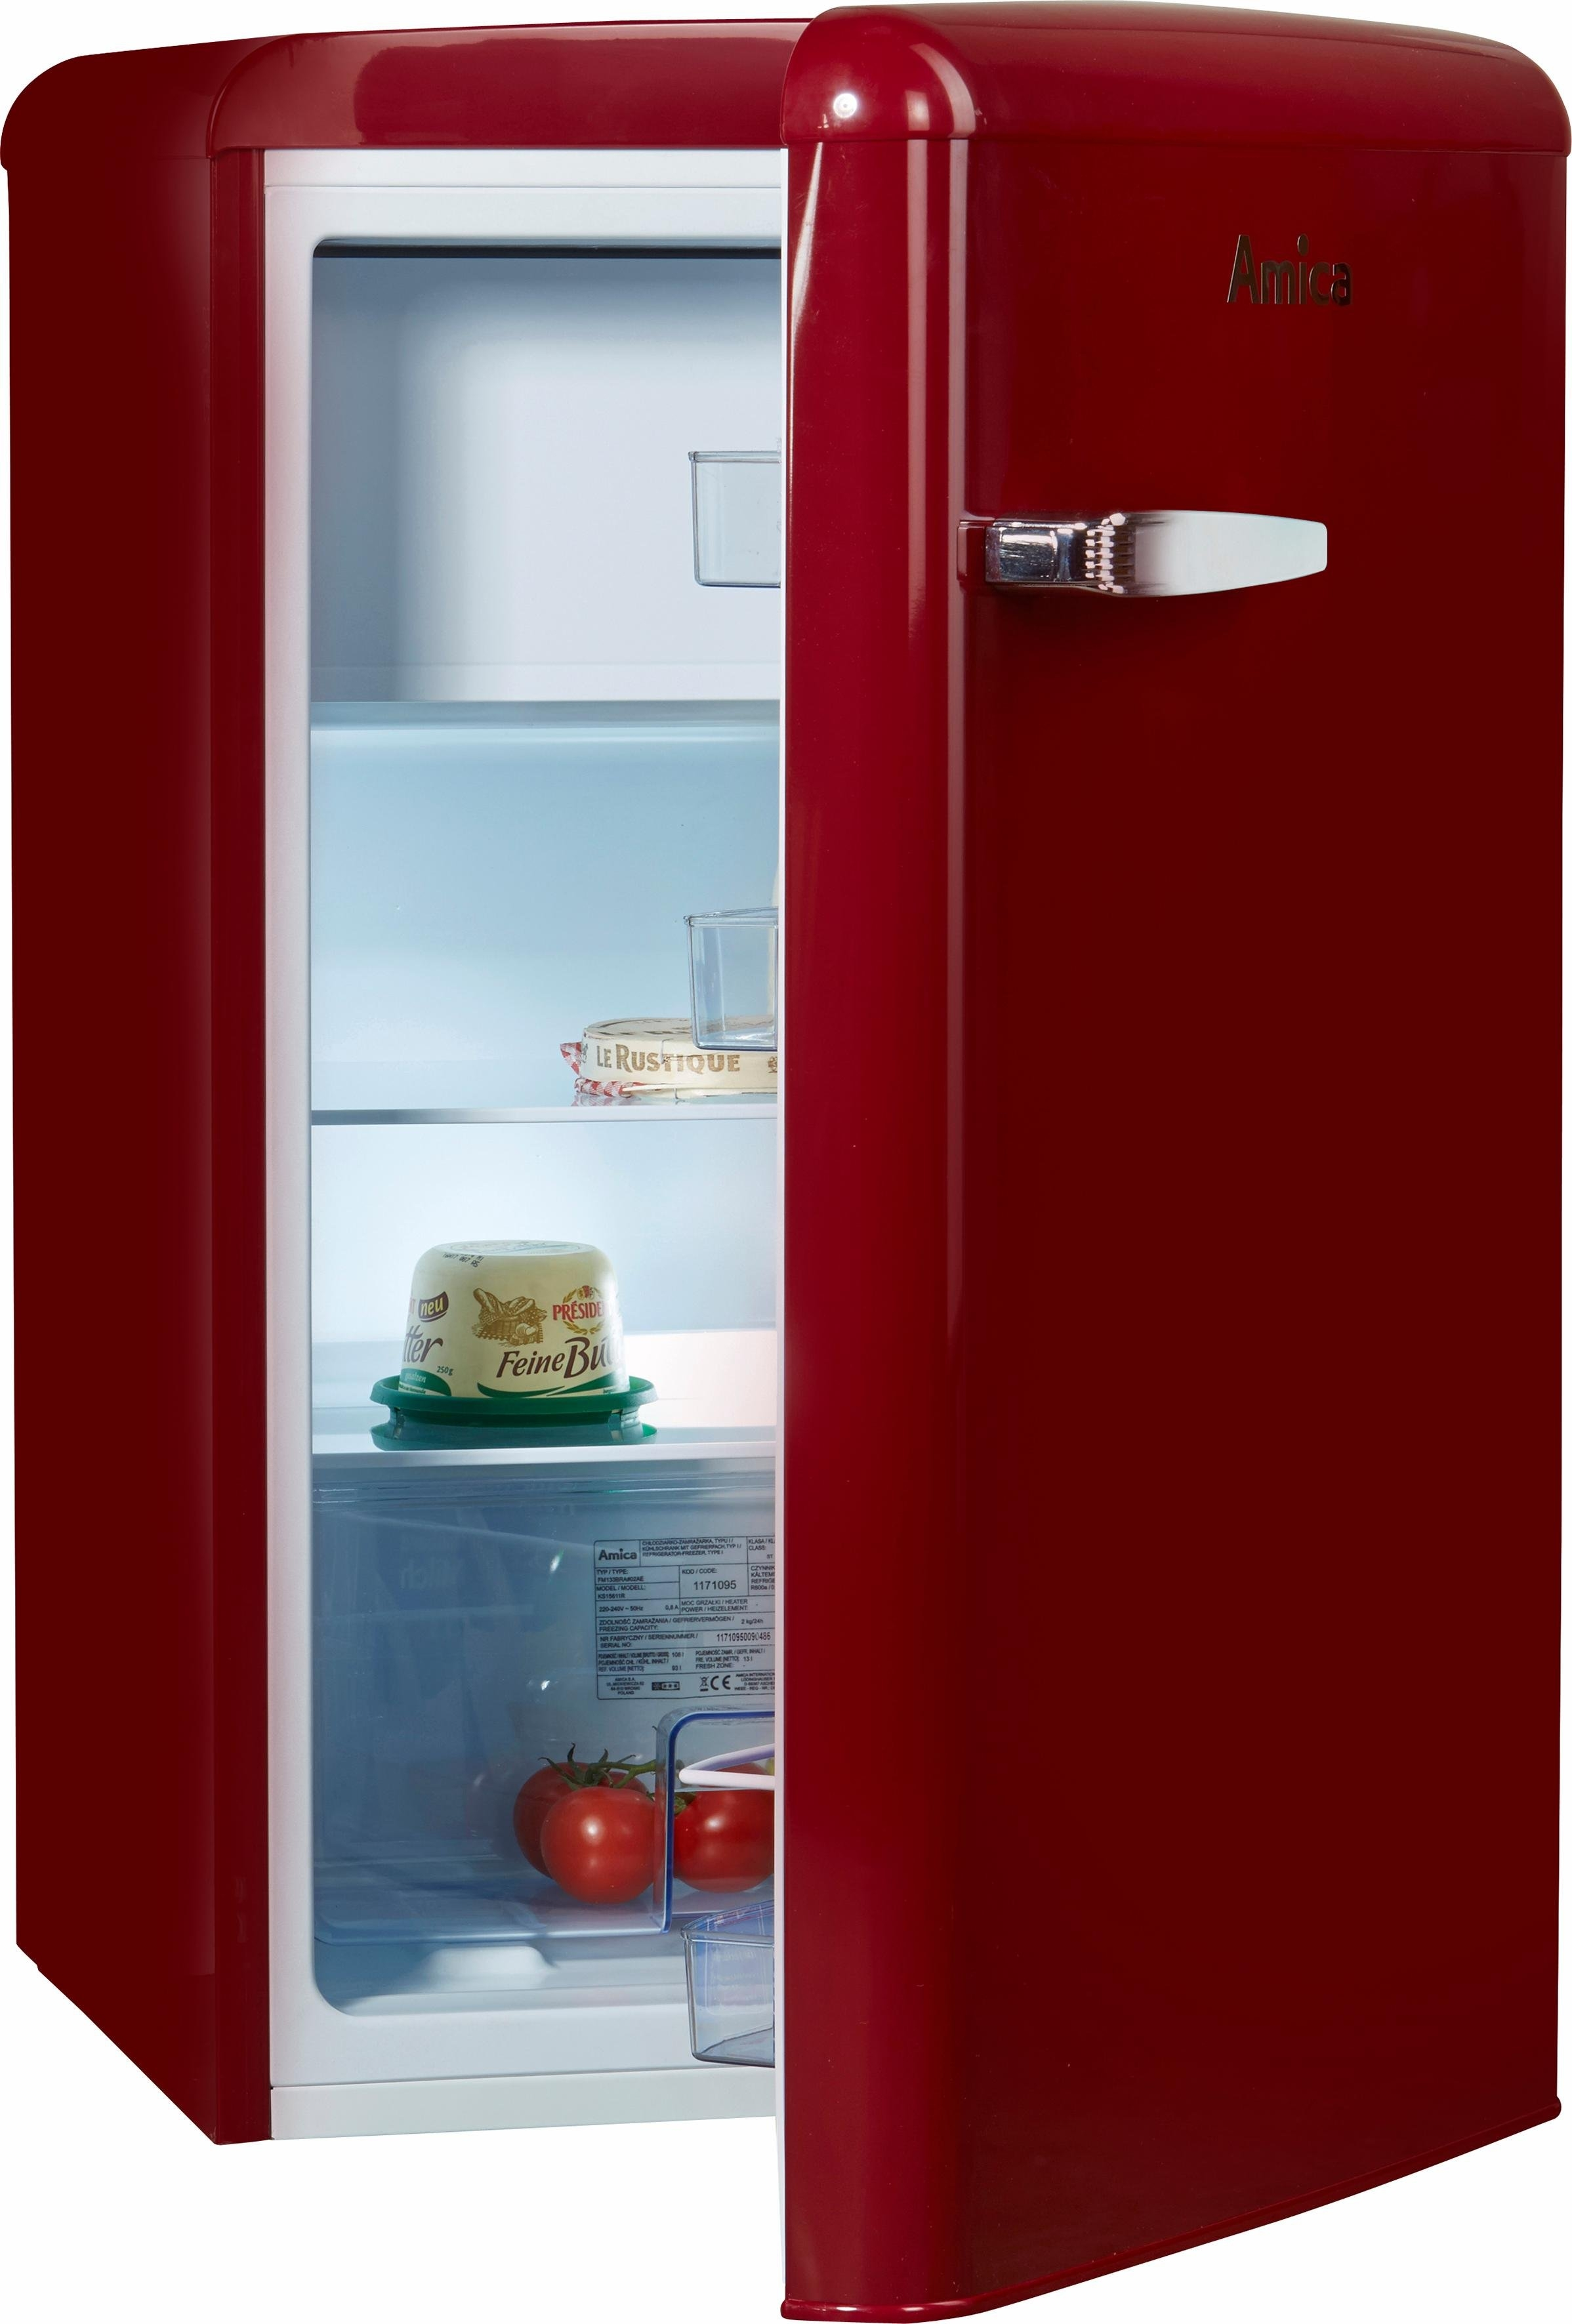 amica koelkast ks 15611 r a 86 cm hoog bestel nu bij otto. Black Bedroom Furniture Sets. Home Design Ideas